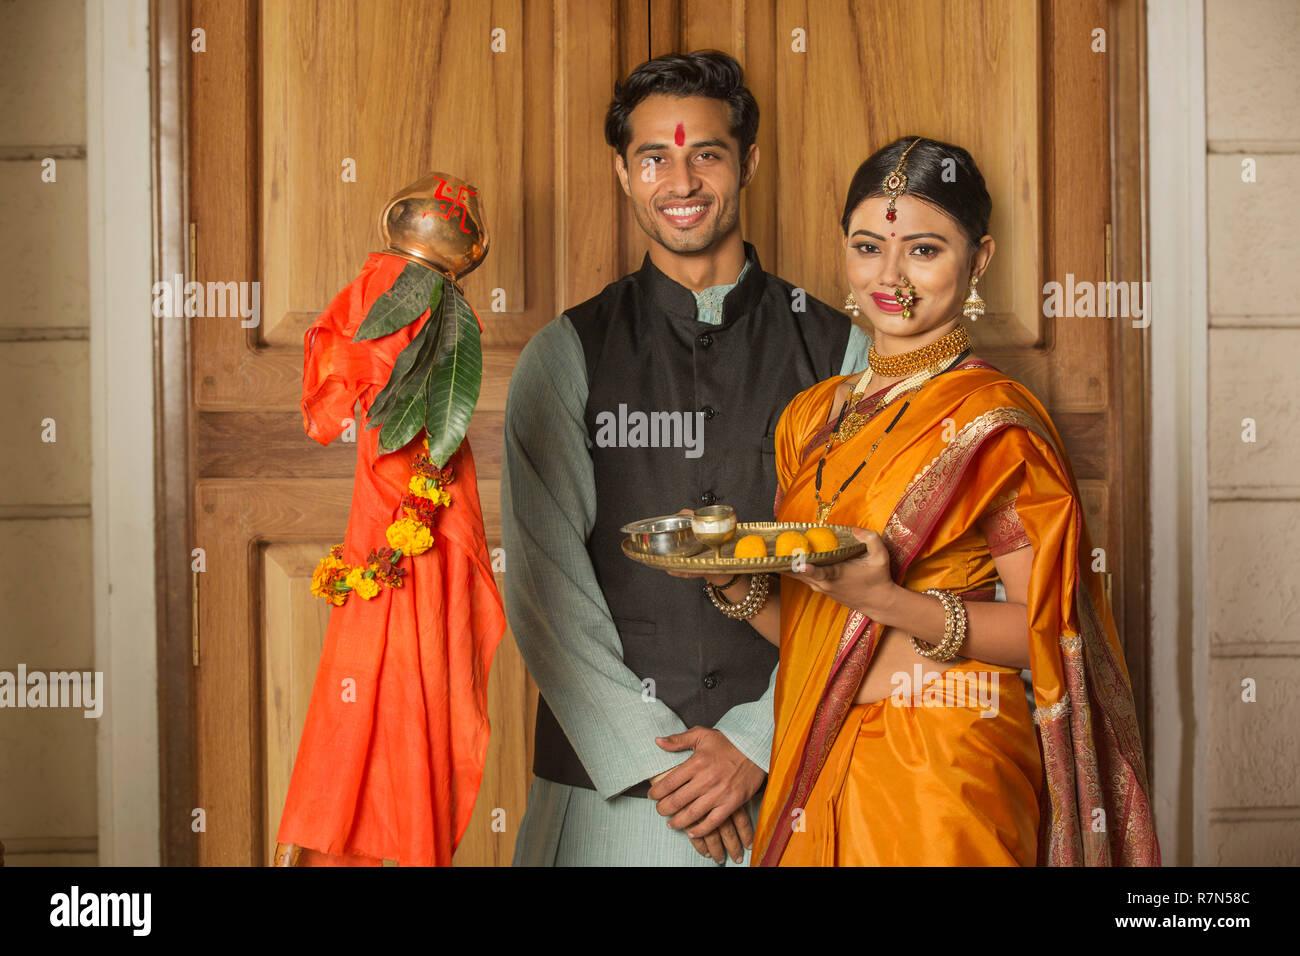 Happy Maharashtrian Couple In Traditional Dress Celebrating Gudi Padwa Festival Holding A Pooja Plate And Posing Stock Photo Alamy